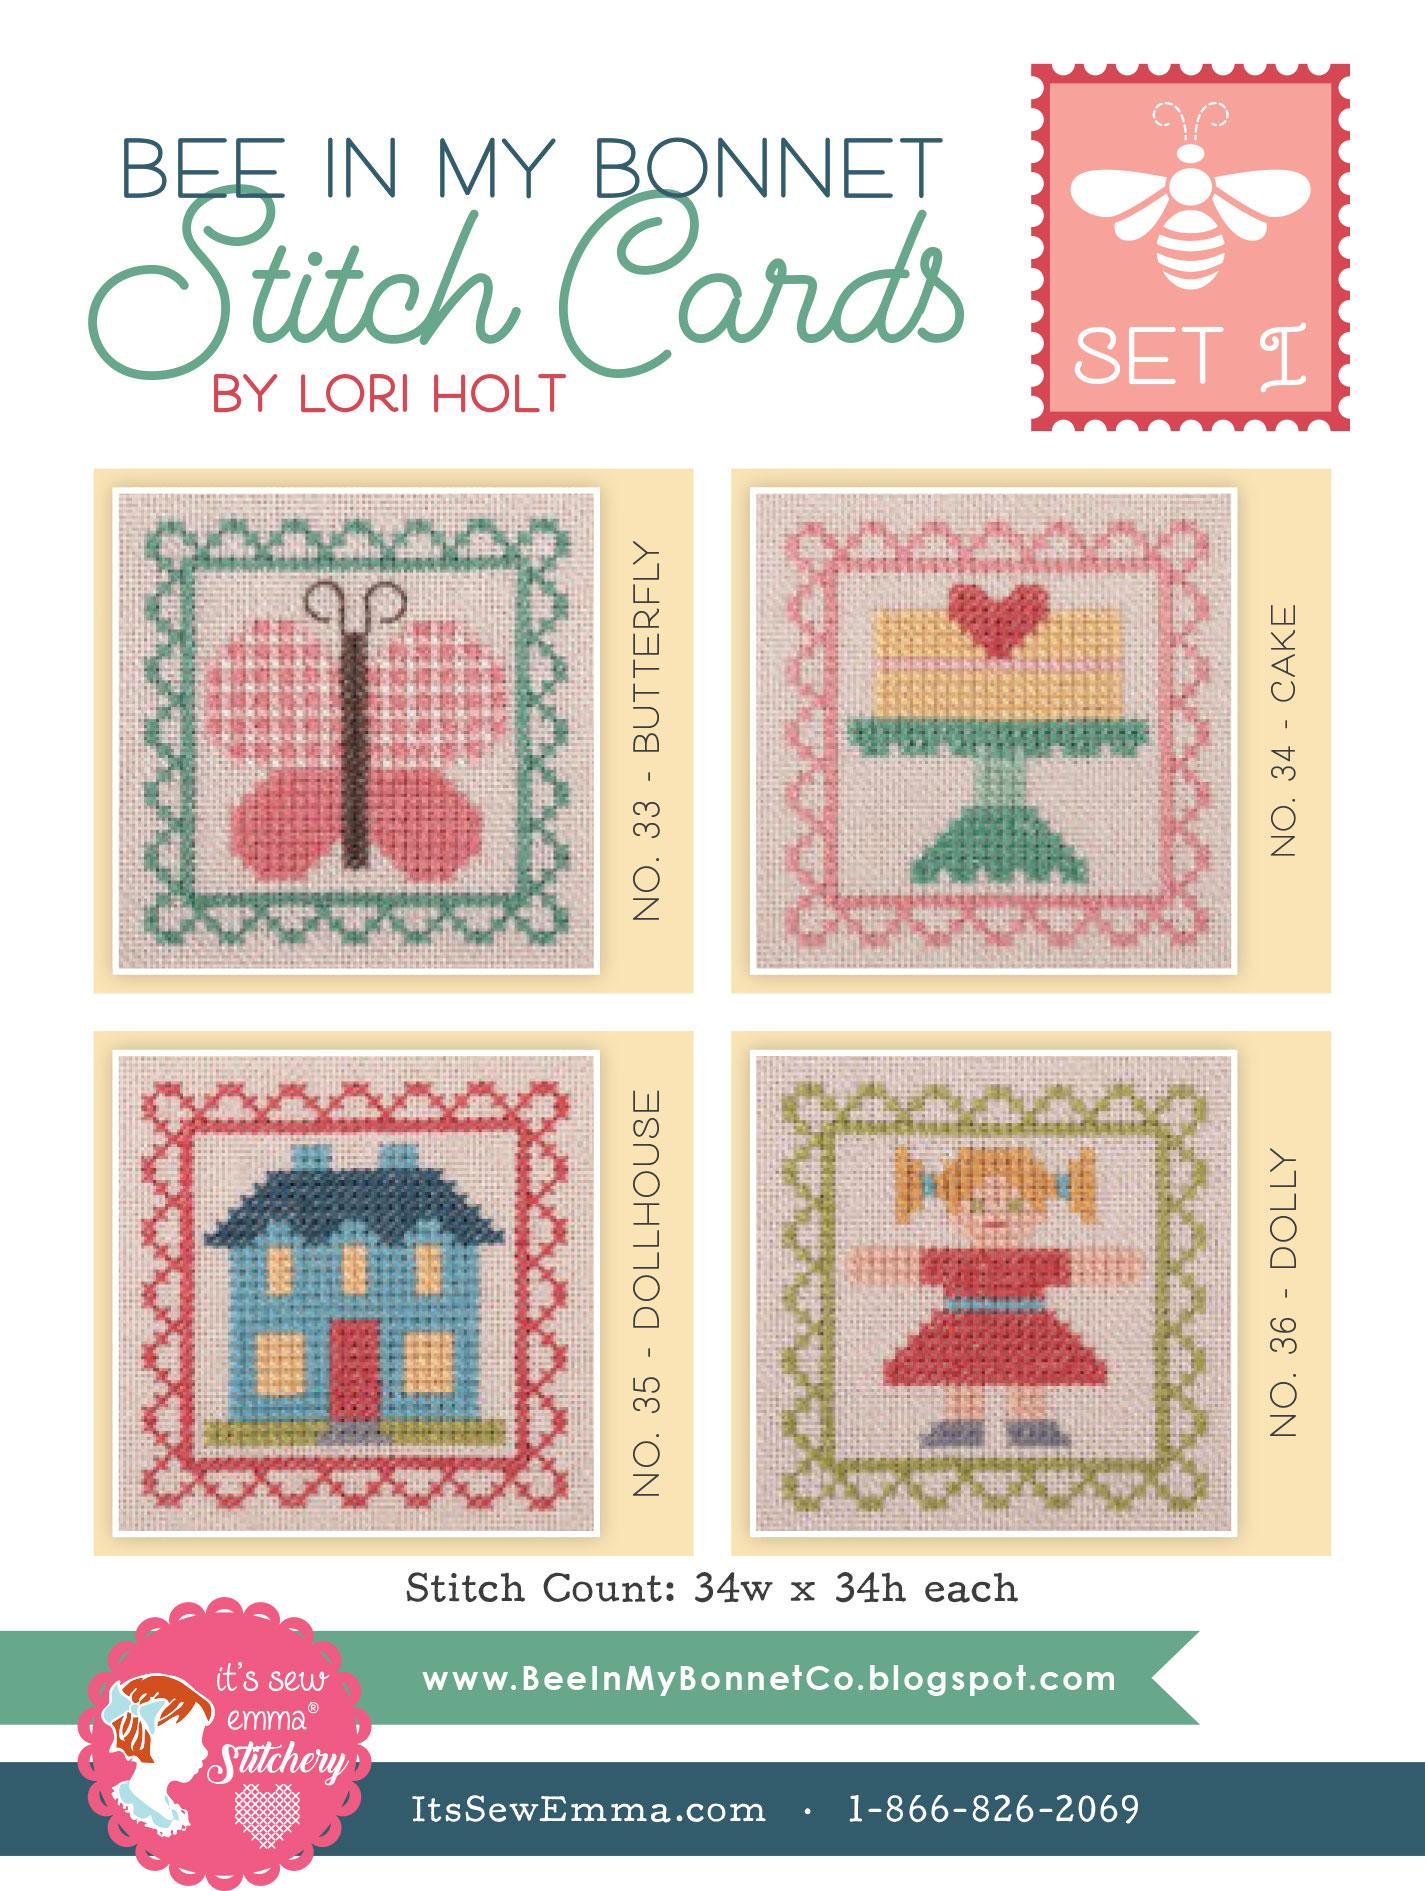 Bee In My Bonnet Stitch Cards Set 1 by Lori Holt of Bee In My Bonnet Co/It's Sew Emma